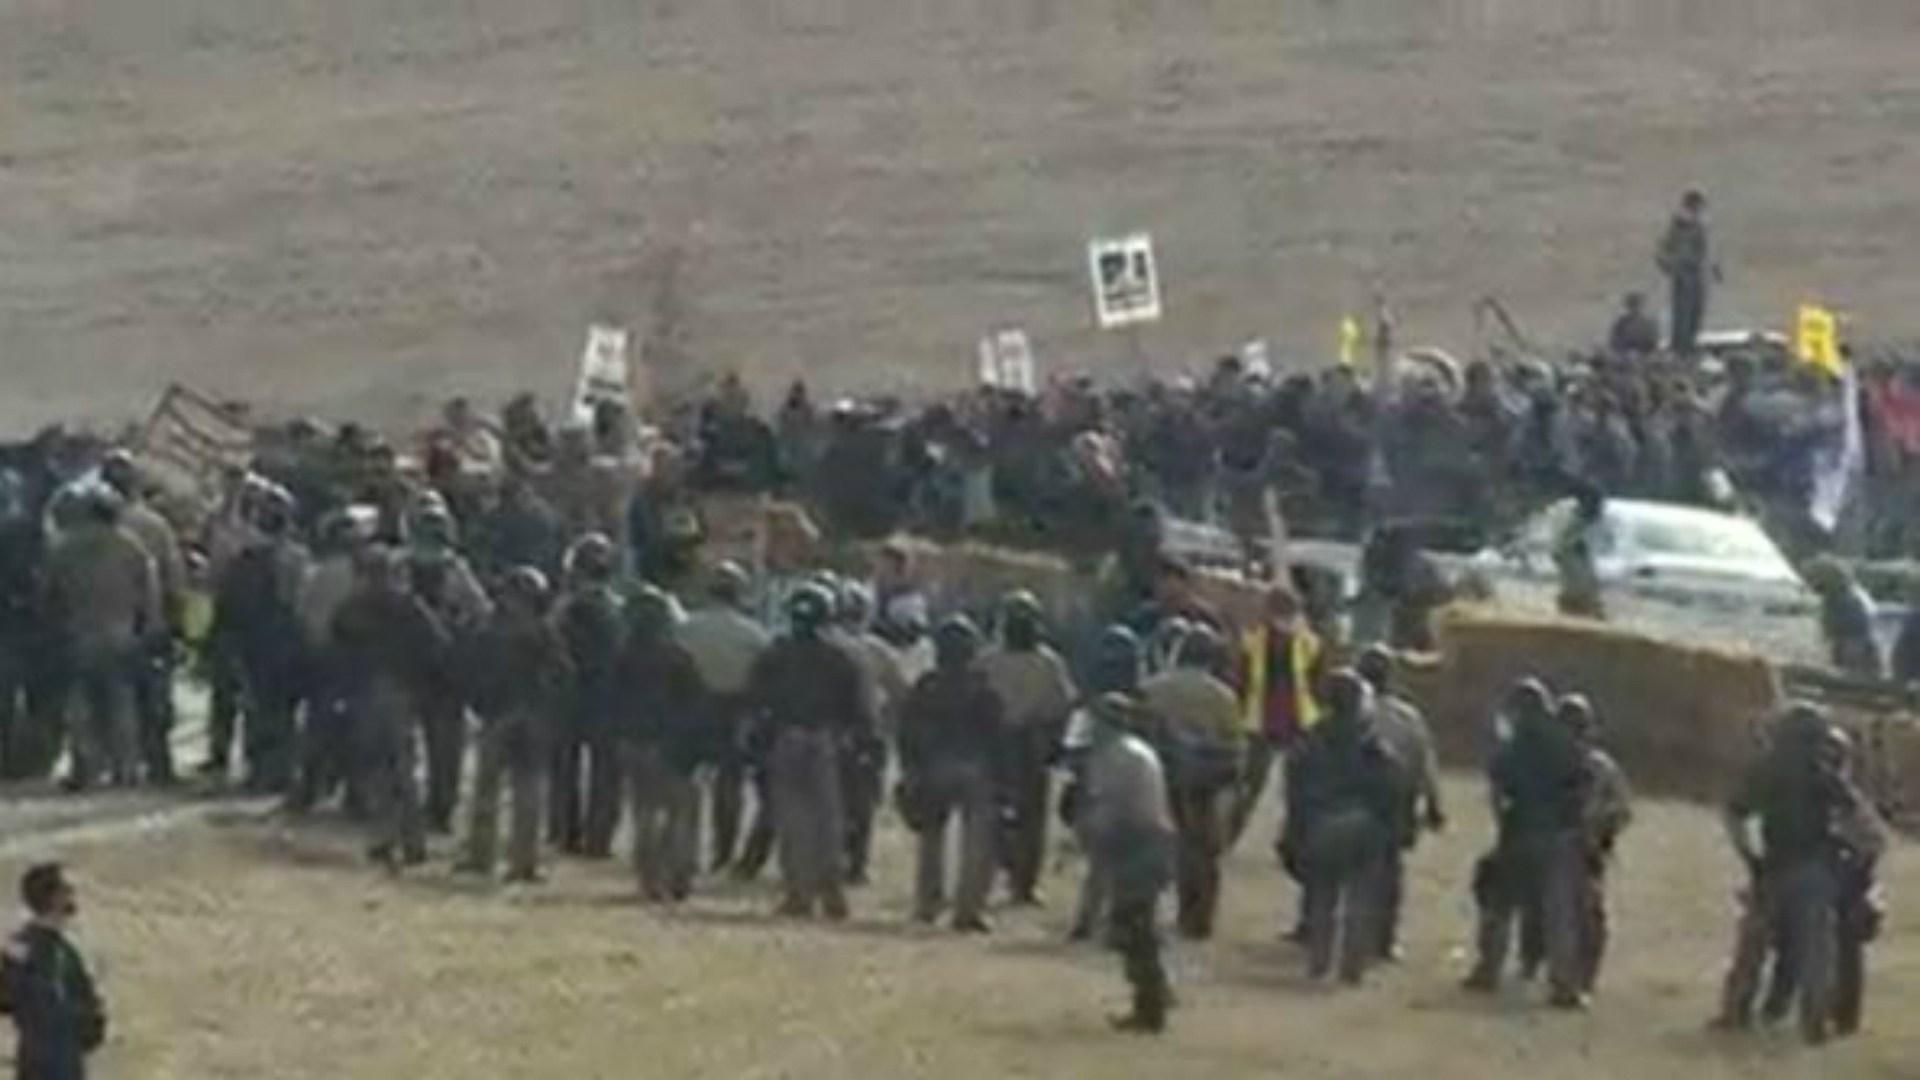 Tribal leader encouraged by Dakota Access delay